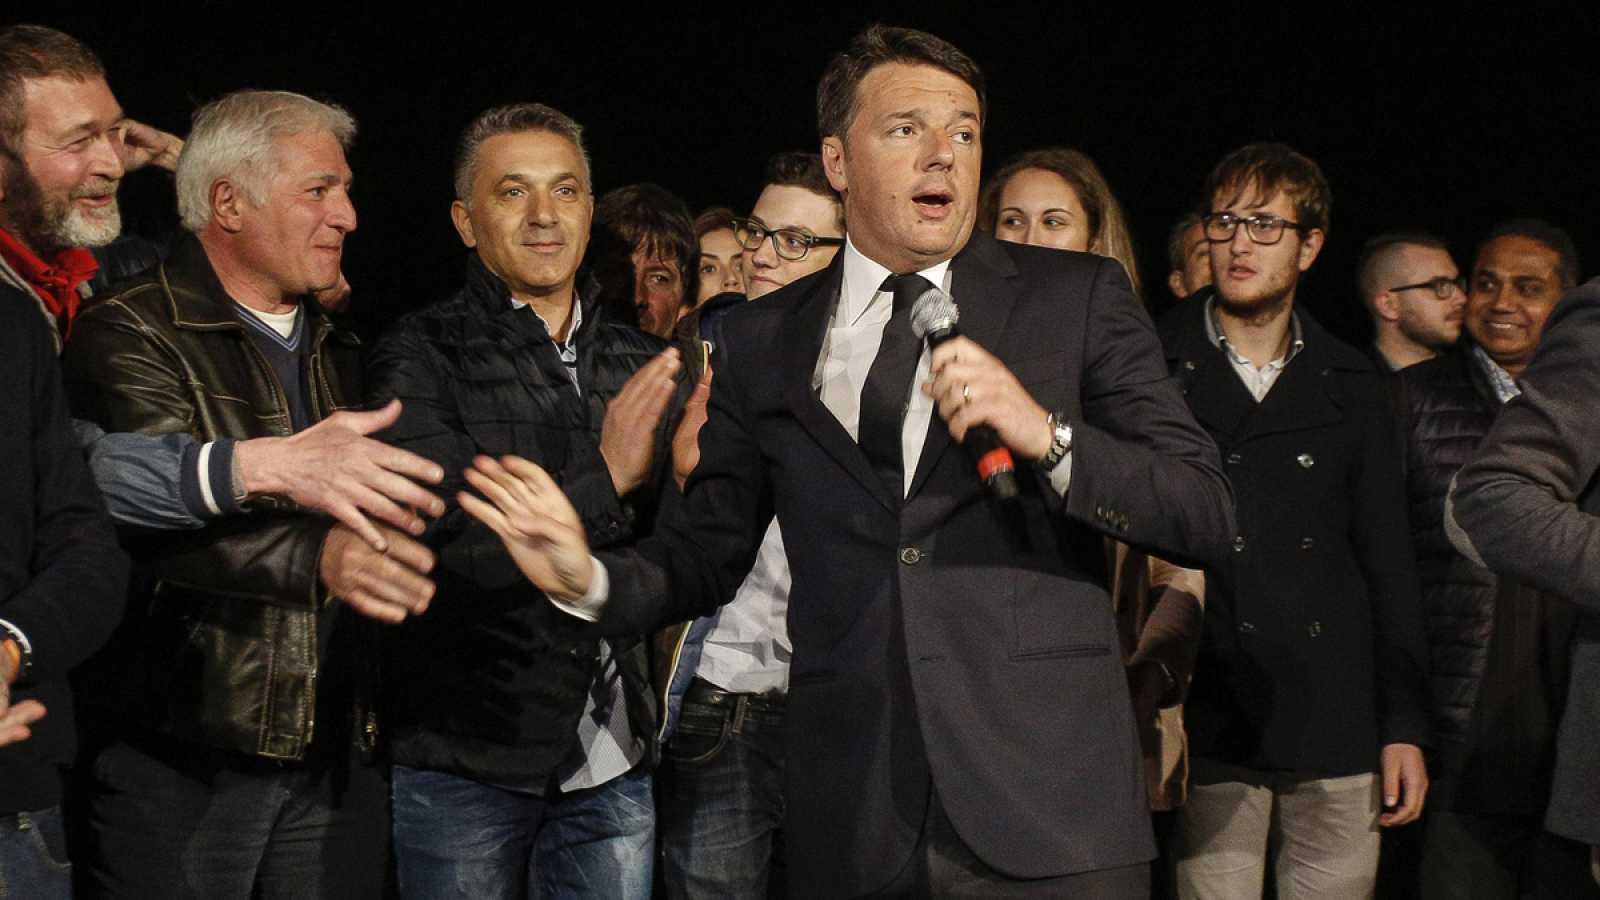 Matteo Renzi da un discurso posterior a su victoria en la sede del Partido Democratico.